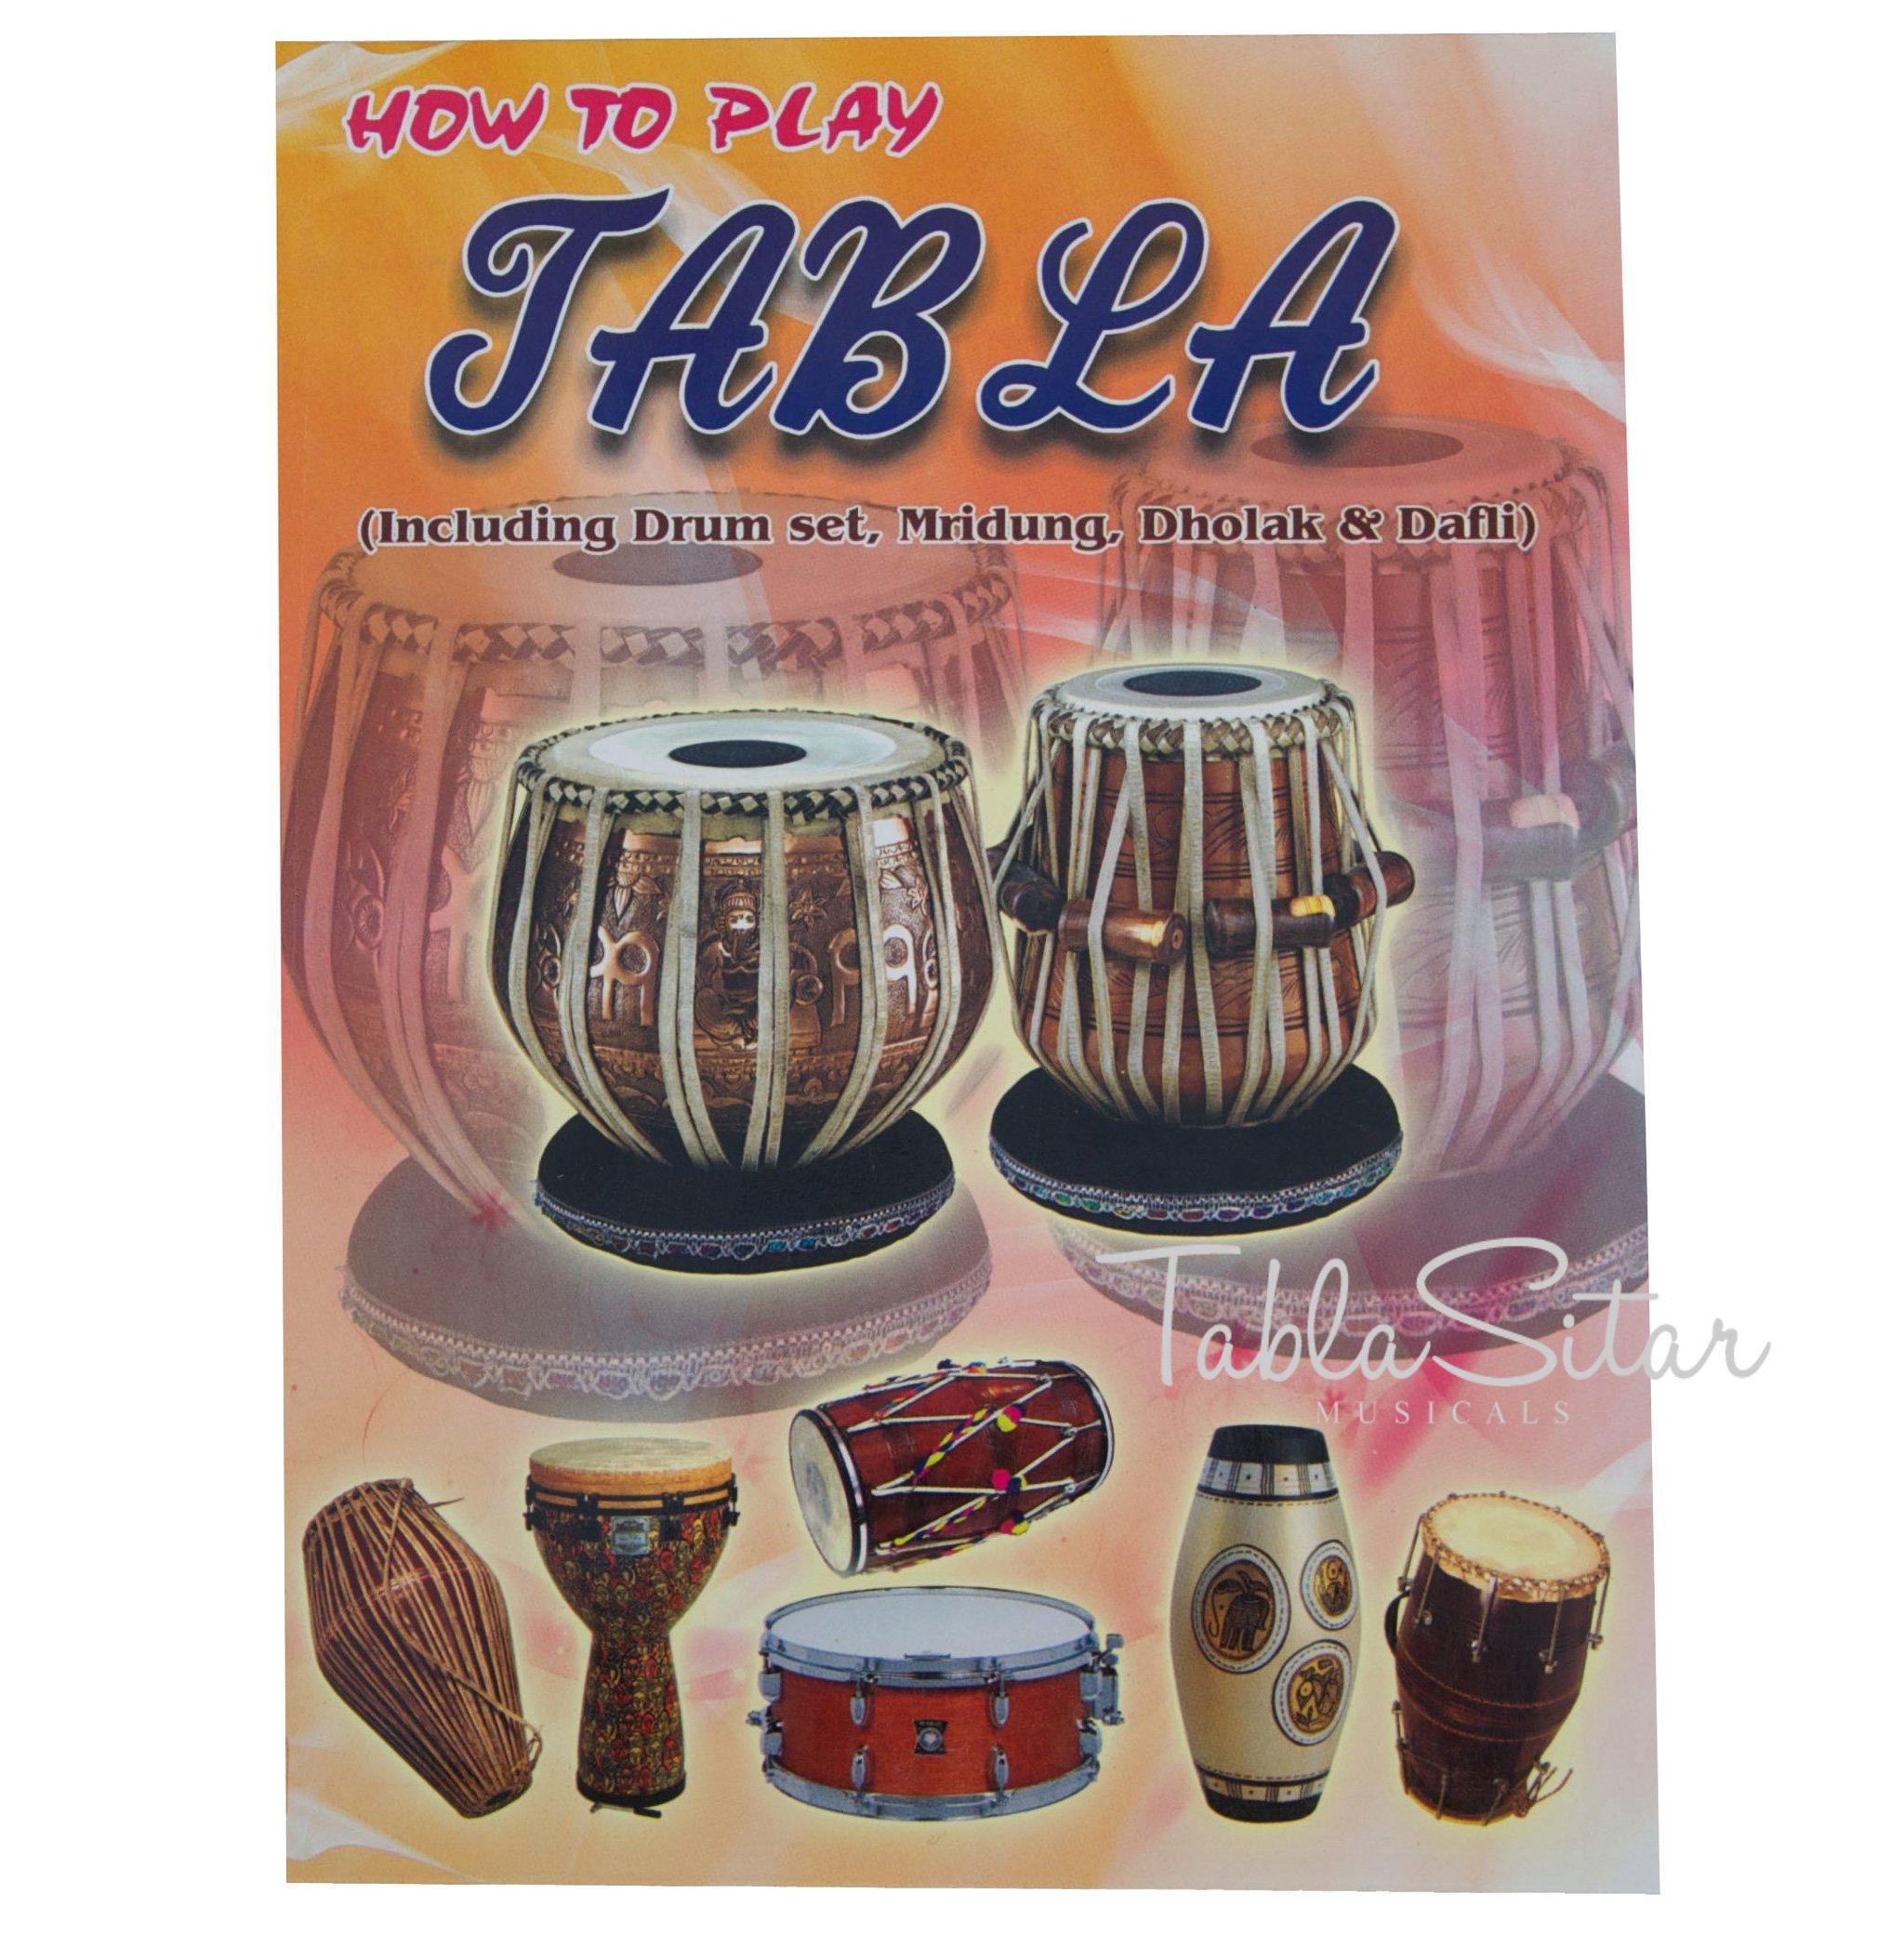 Tabla Drum Set by Maharaja Musicals, Professional, 3.5 Kg Copper Bayan - Designer Carving, Sheesham Tabla Dayan, Padded Bag, Book, Hammer, Cushions, Cover, Tabla Musical Instrument (PDI-CJH) by Maharaja Musicals (Image #9)